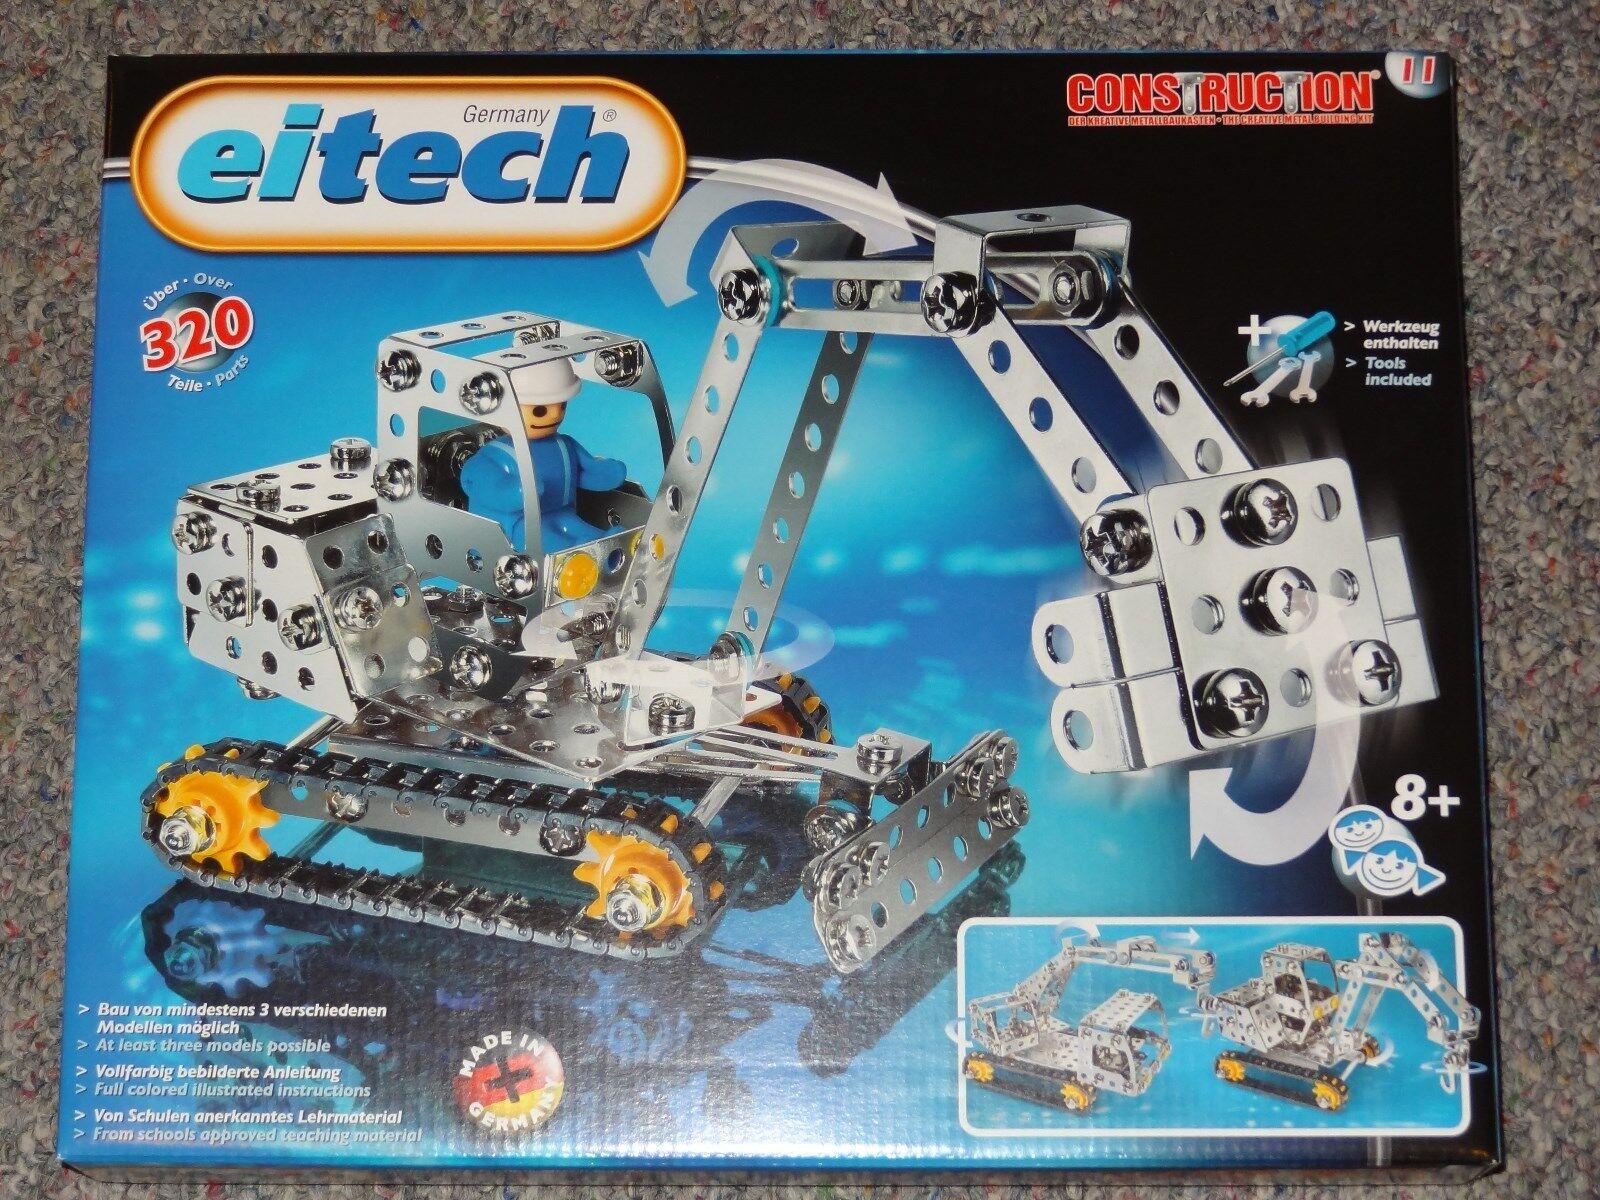 Construction Vehicles Eitech C11 Metal Construction Building Toy Steel Model Kit